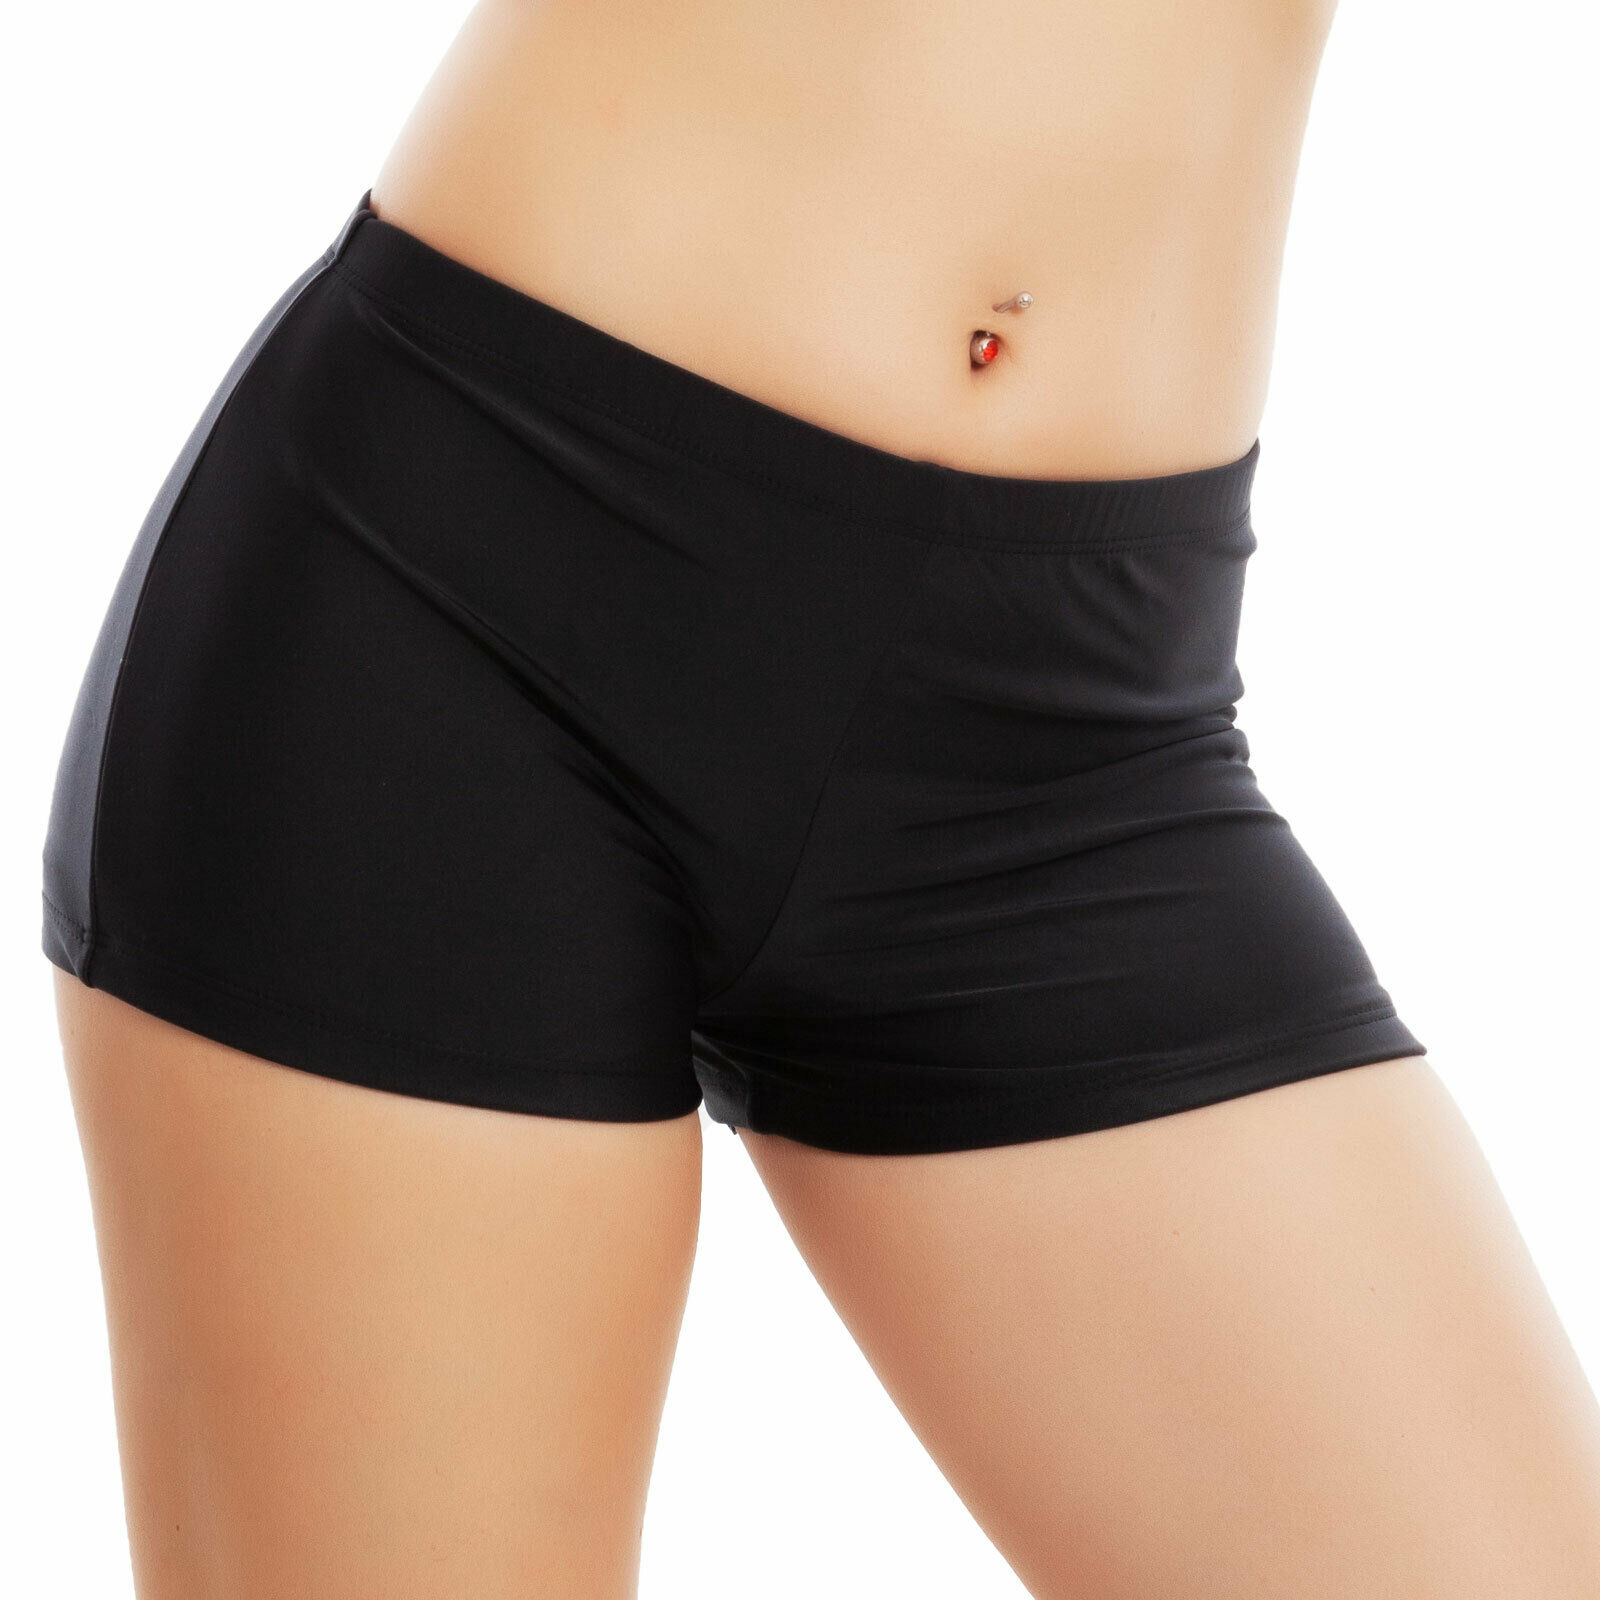 Costume da bagno donna culotte mare pantaloncini curvy shorts TOOCOOL DY7743